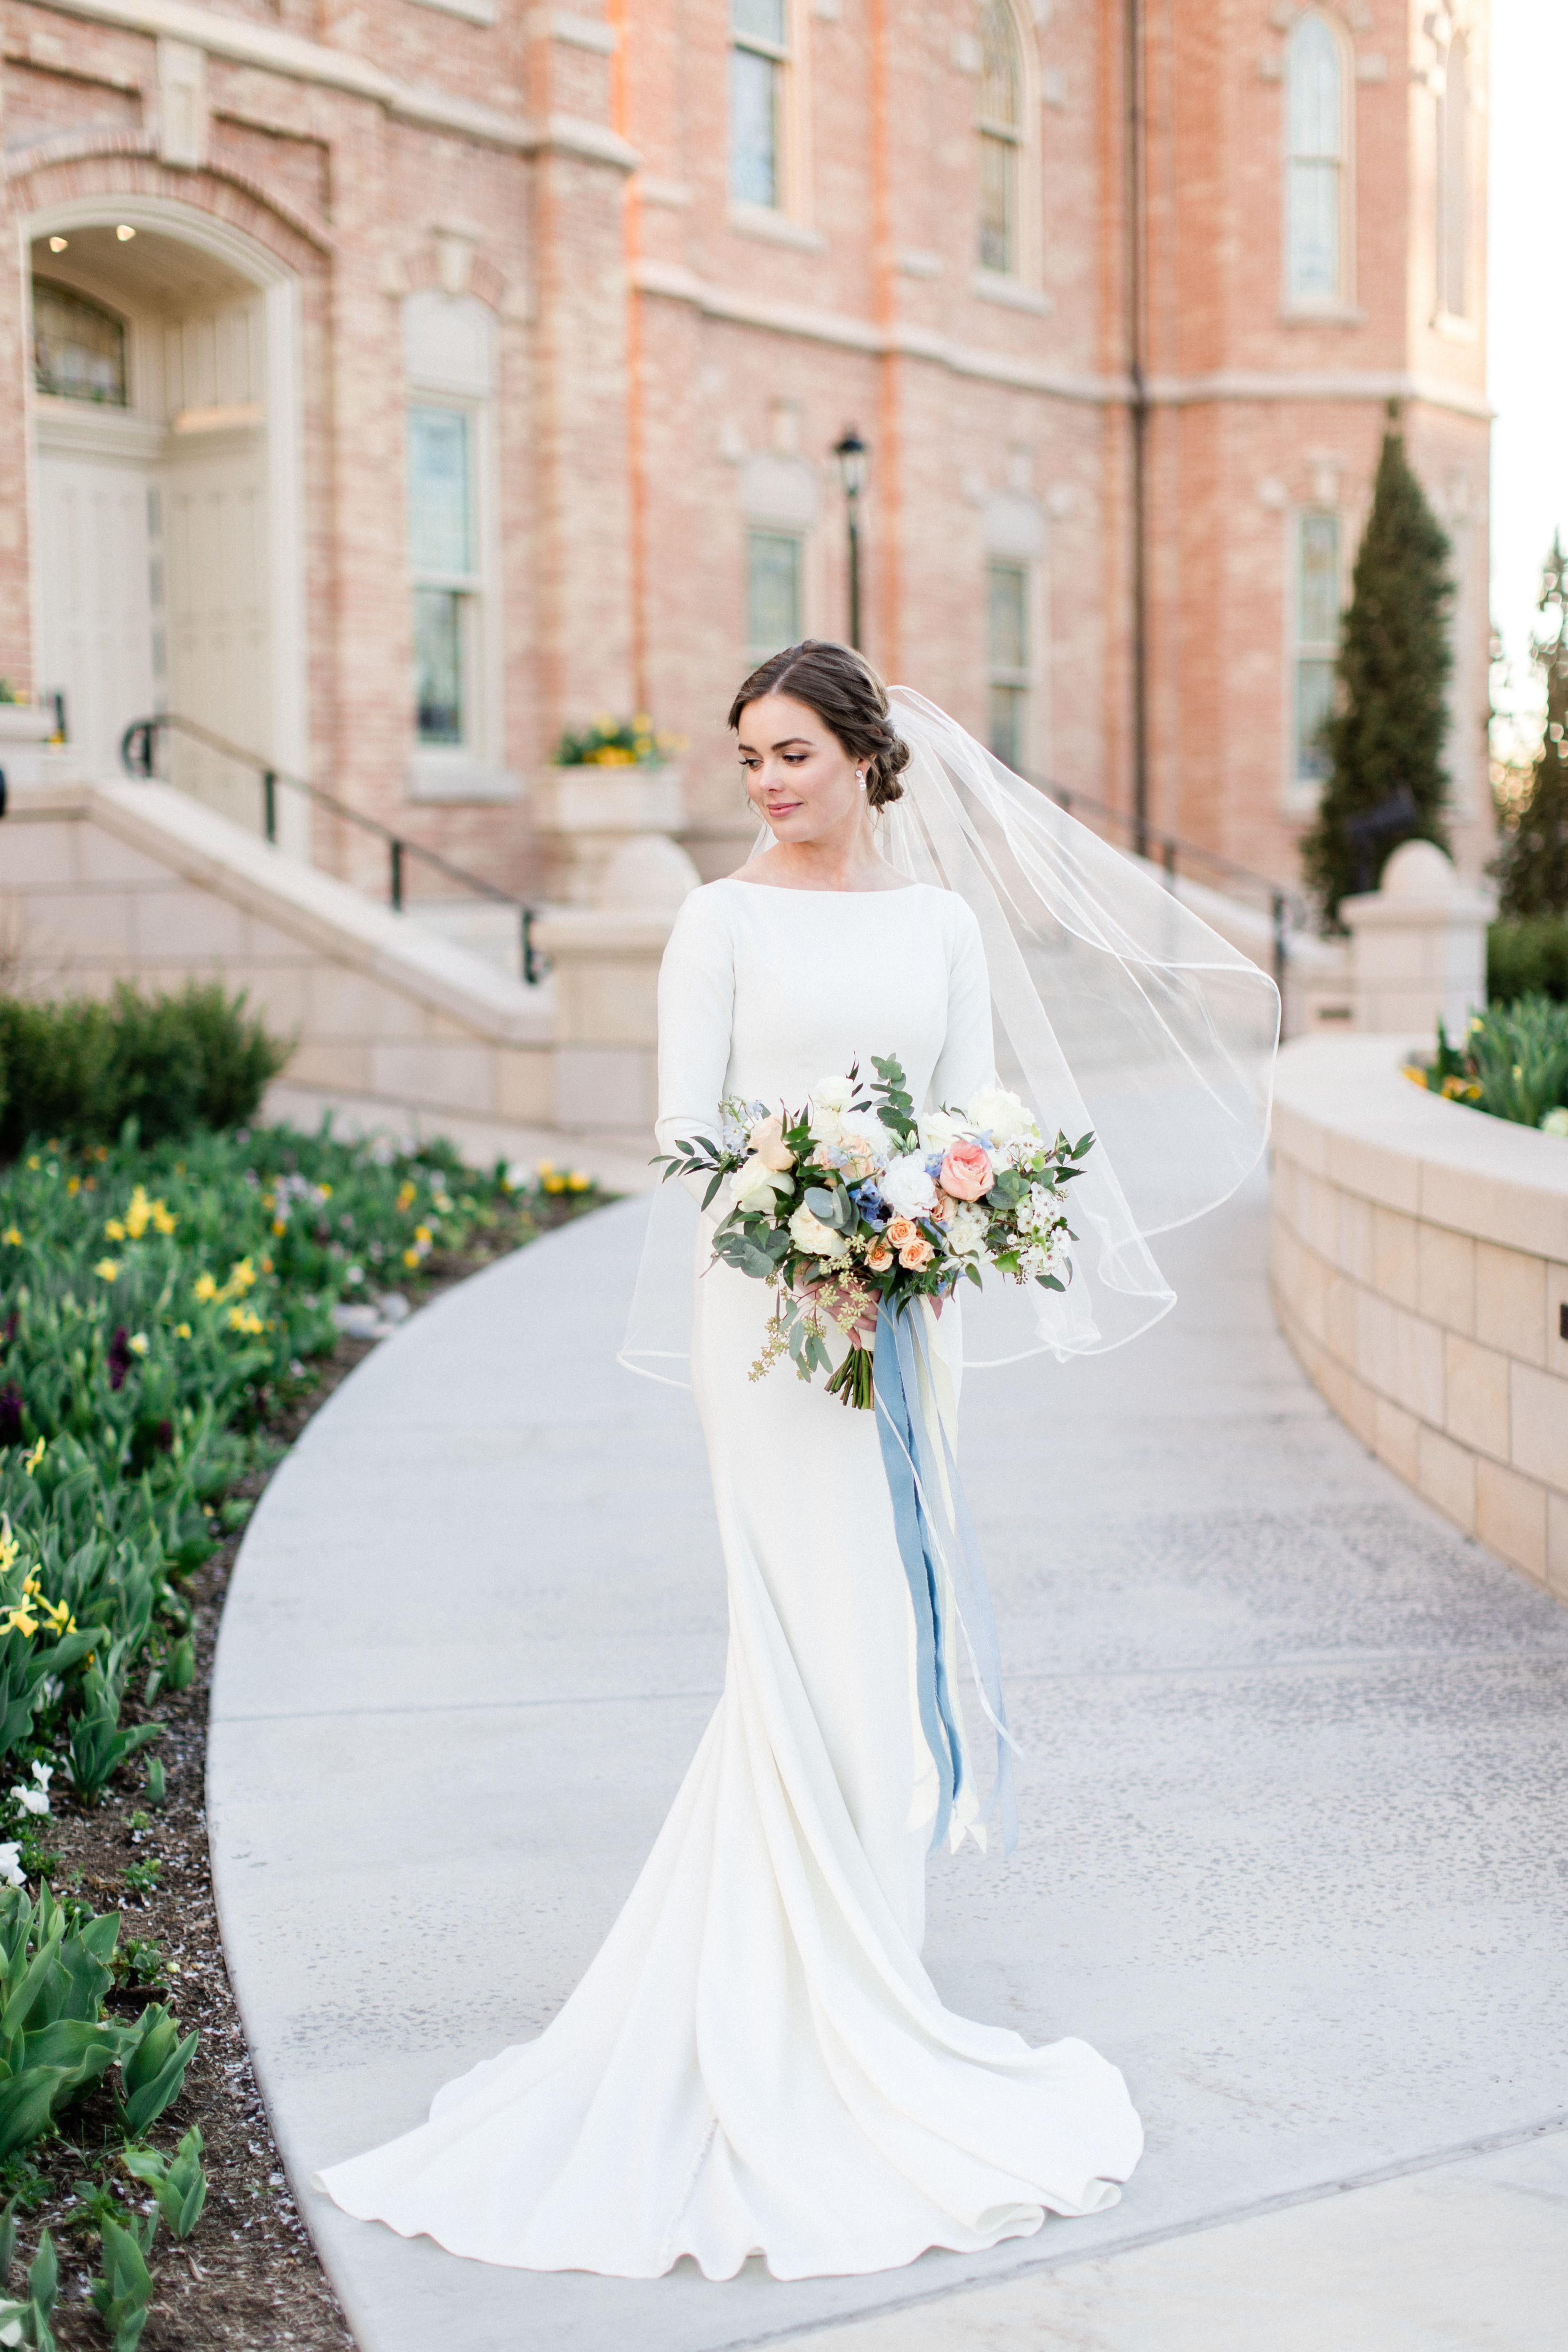 Markella In Stock Modest Long Sleeve Wedding Dresses Modest Wedding Dresses Wedding Dress Long Sleeve [ 5000 x 3333 Pixel ]